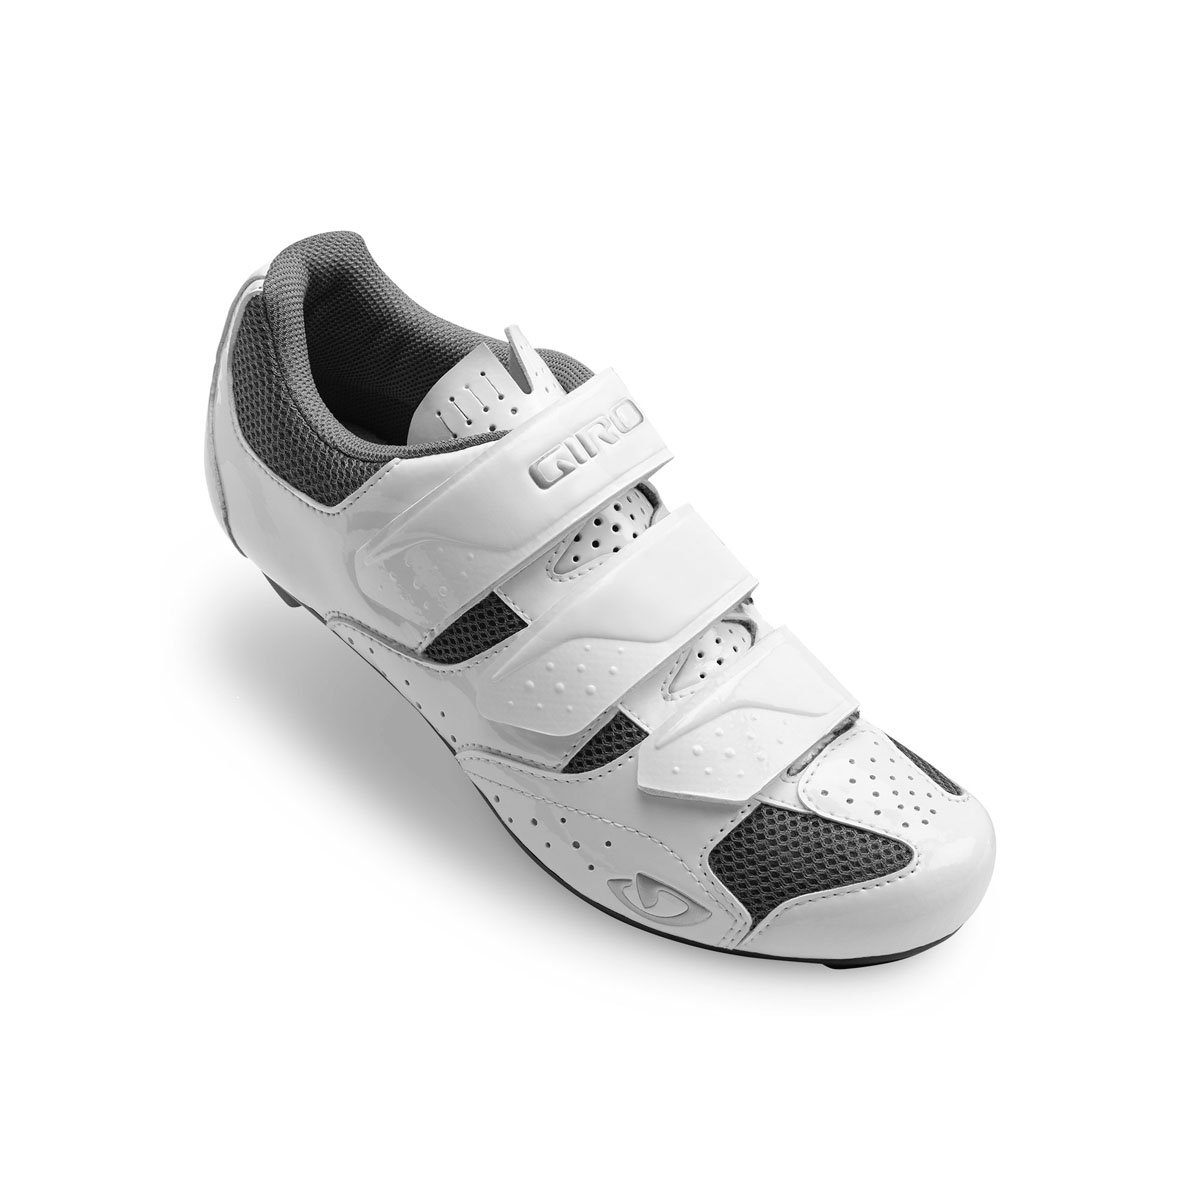 Giro Techne Road, Zapatos de Ciclismo de Carretera para Mujer 43 EU|White/Silver